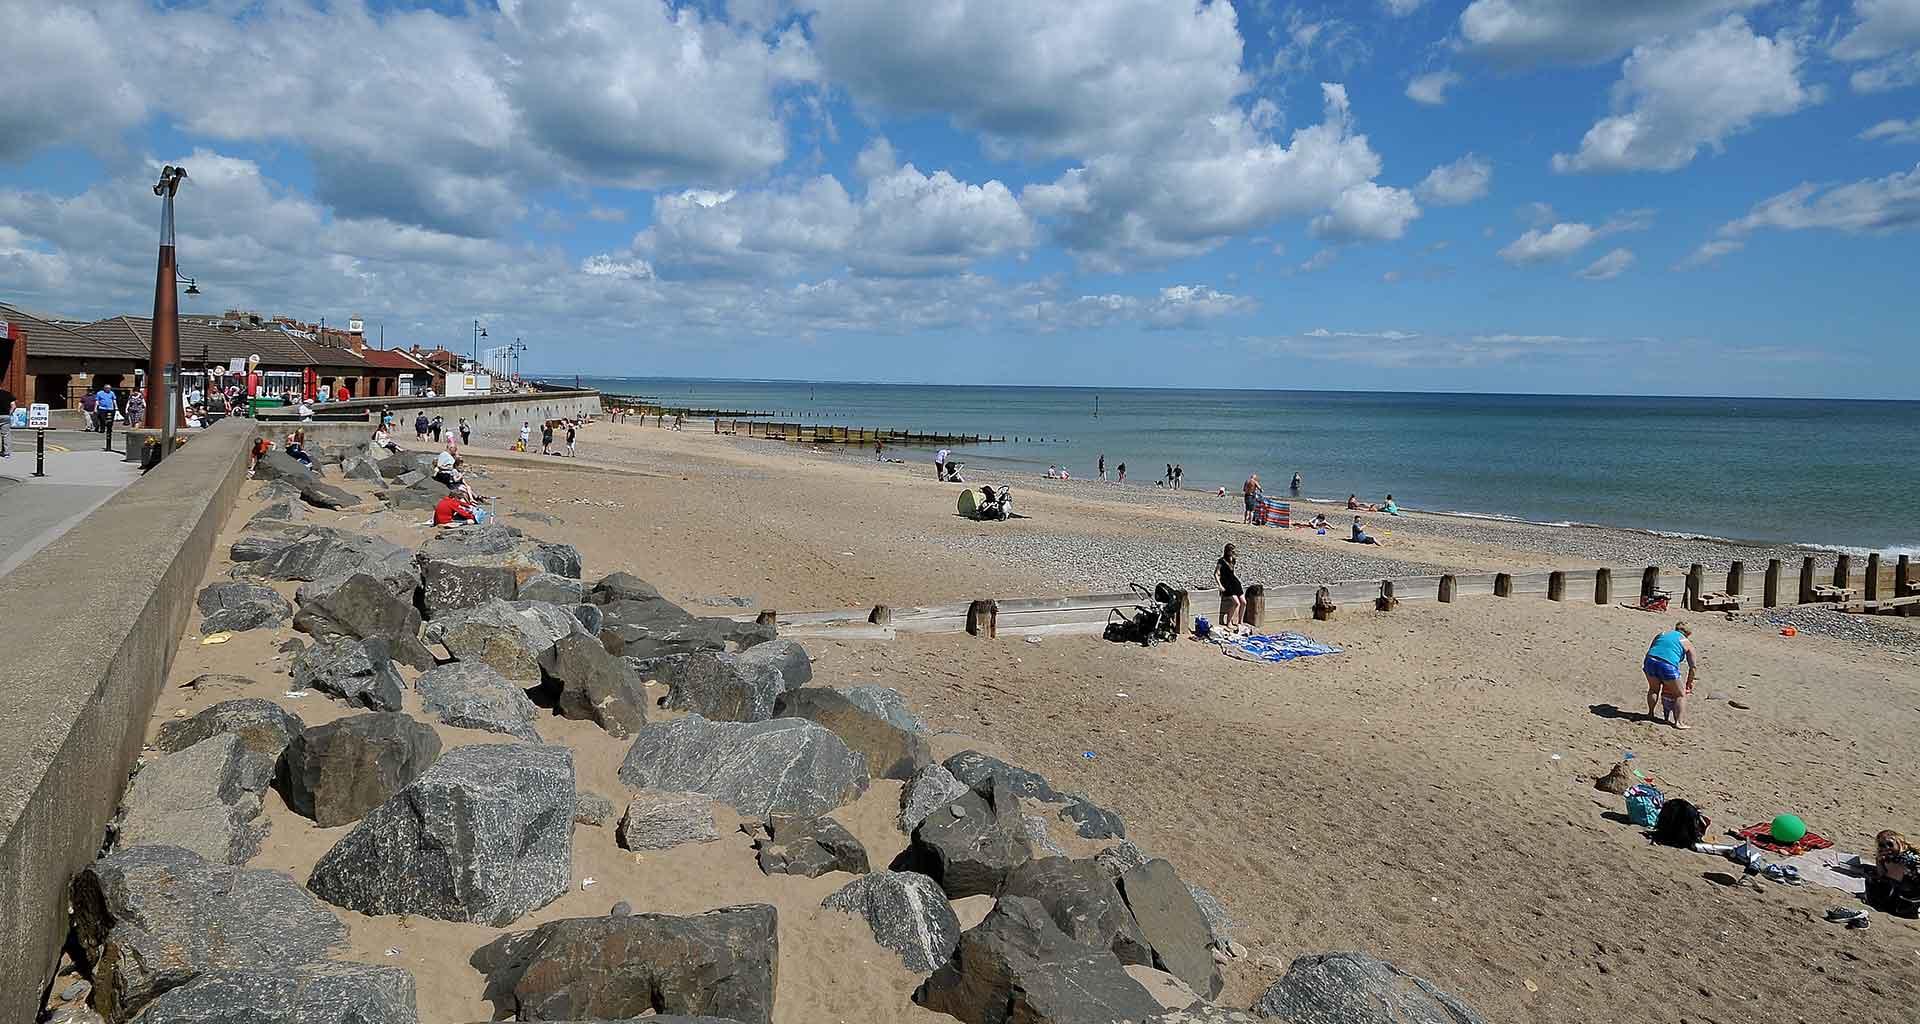 VisitHornsea.co.uk – The definitive resource for Hornsea Hornsea